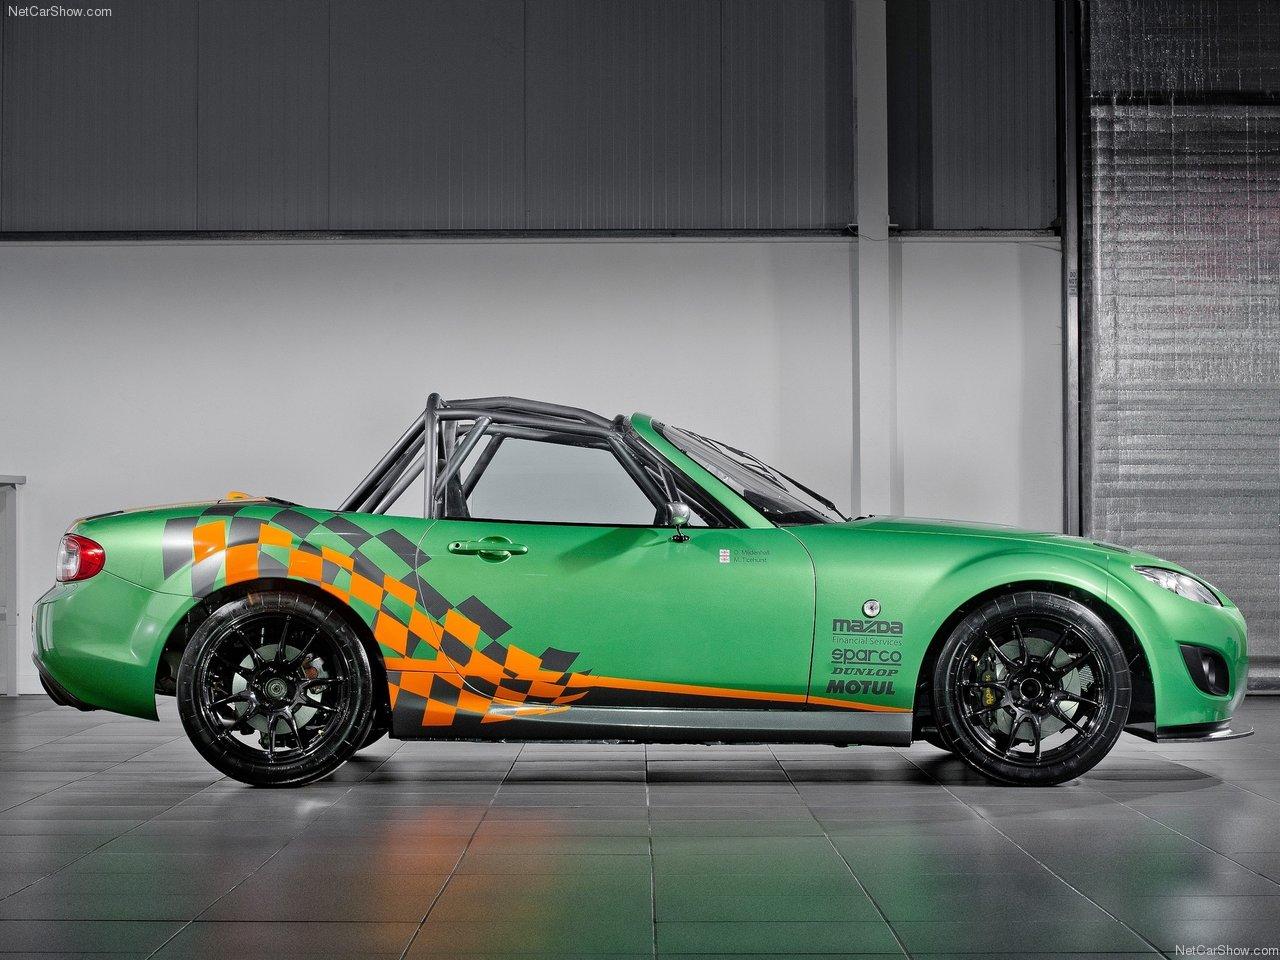 http://3.bp.blogspot.com/-kpEIuXjfOWA/TYnuNLtvX4I/AAAAAAACMNo/62eoZhIpQuU/s1600/Mazda-MX-5_GT_Race_Car_2011_1280x960_wallpaper_02.jpg